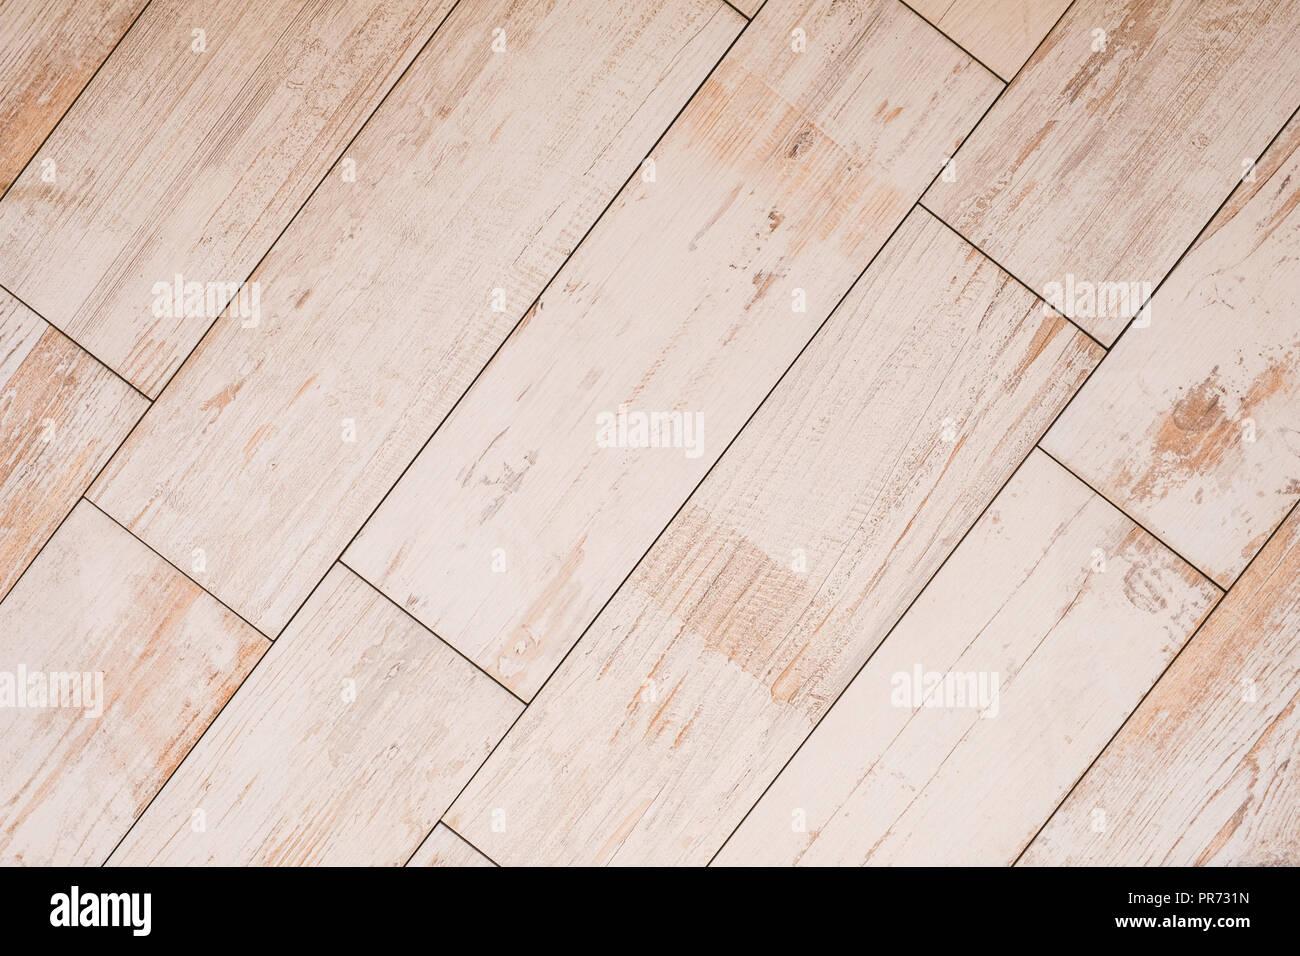 Fliesen Holz Brett Boden Parkett Fliesen Laminat Stockfoto Bild